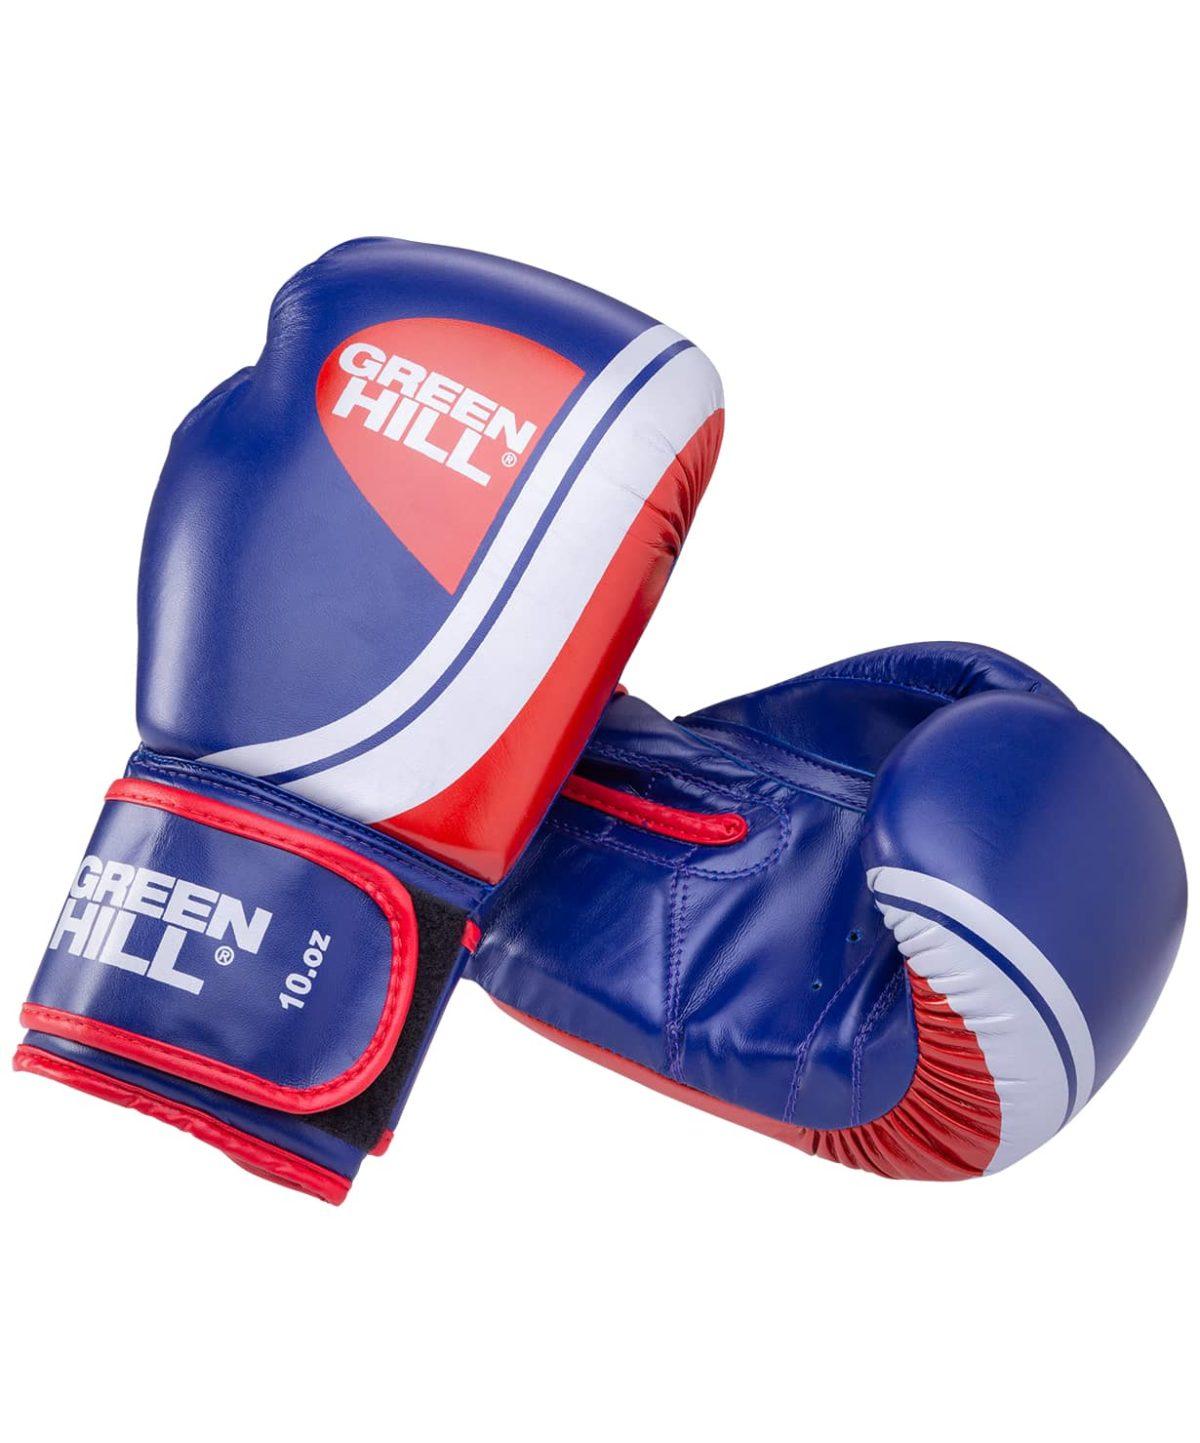 GREEN HILL Перчатки боксерские 12 oz Knockout  BGK-2266: синий - 1